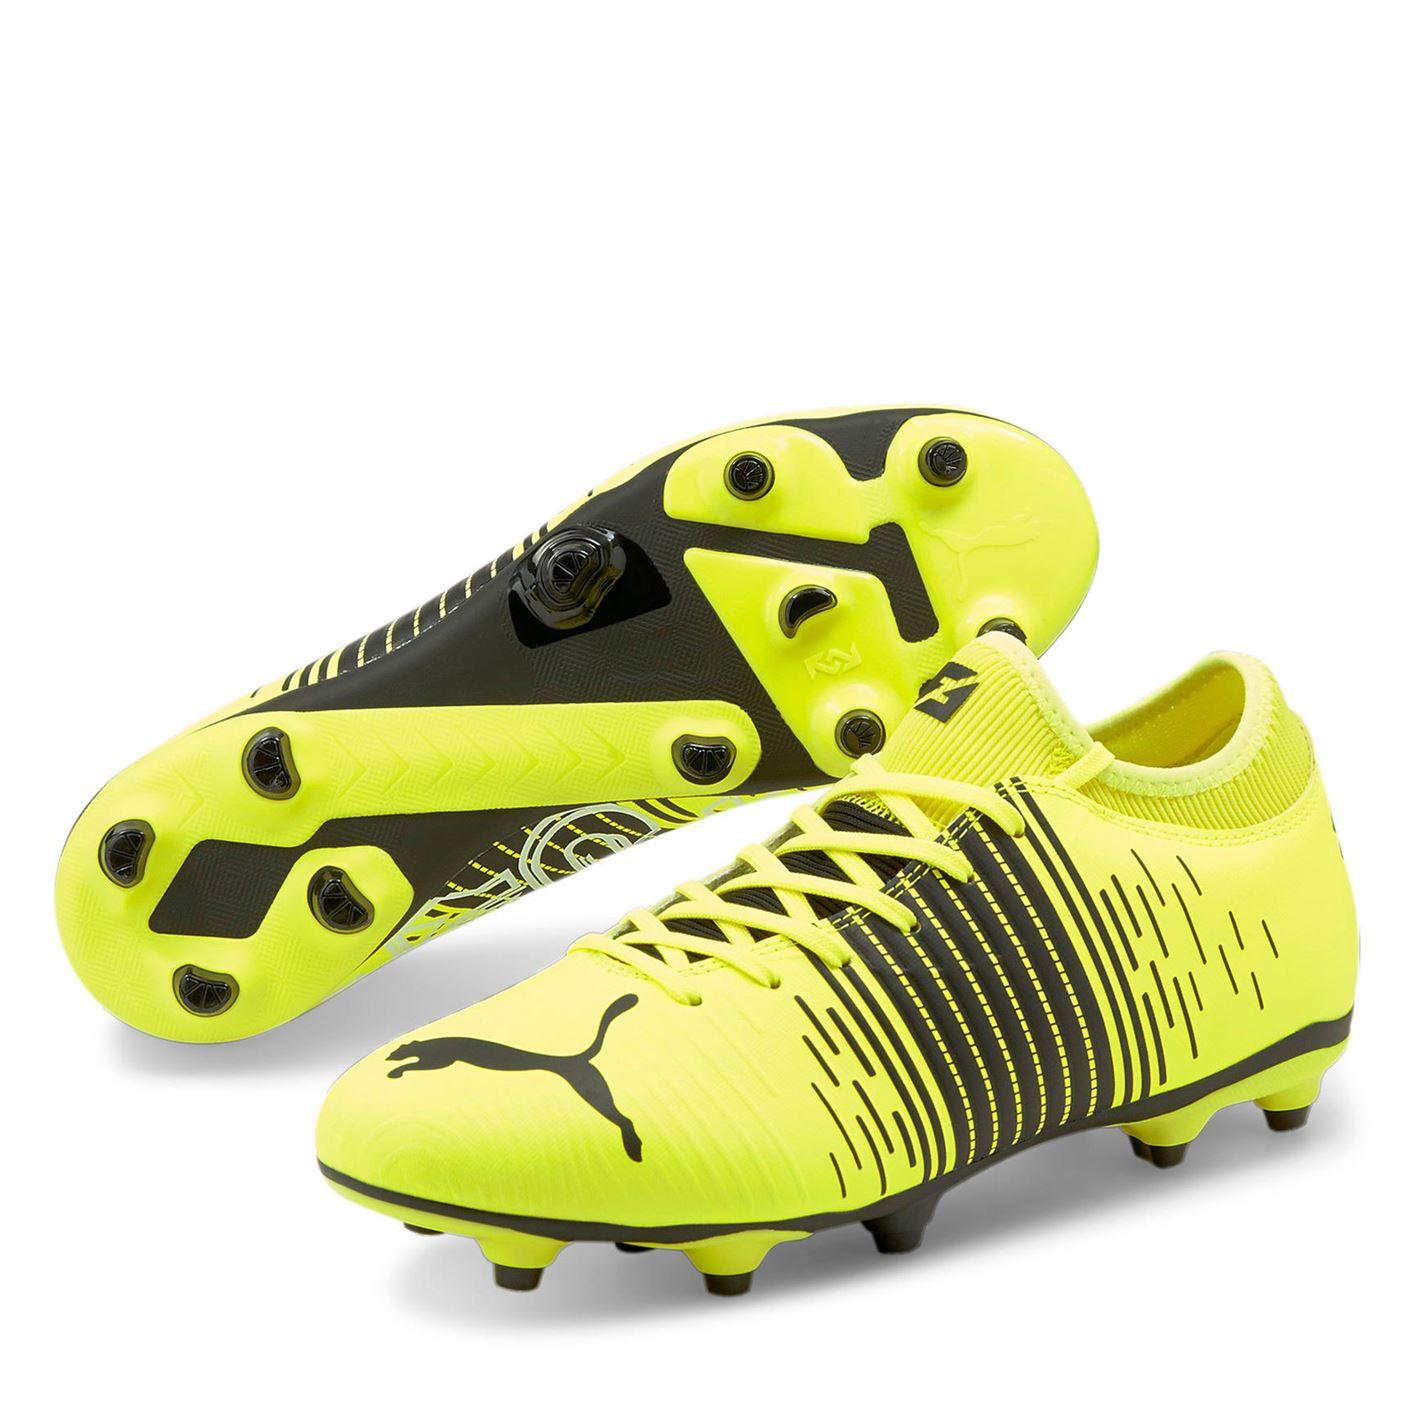 Mergi la Ghete de fotbal Puma Future Z 4.1 FG galben negru